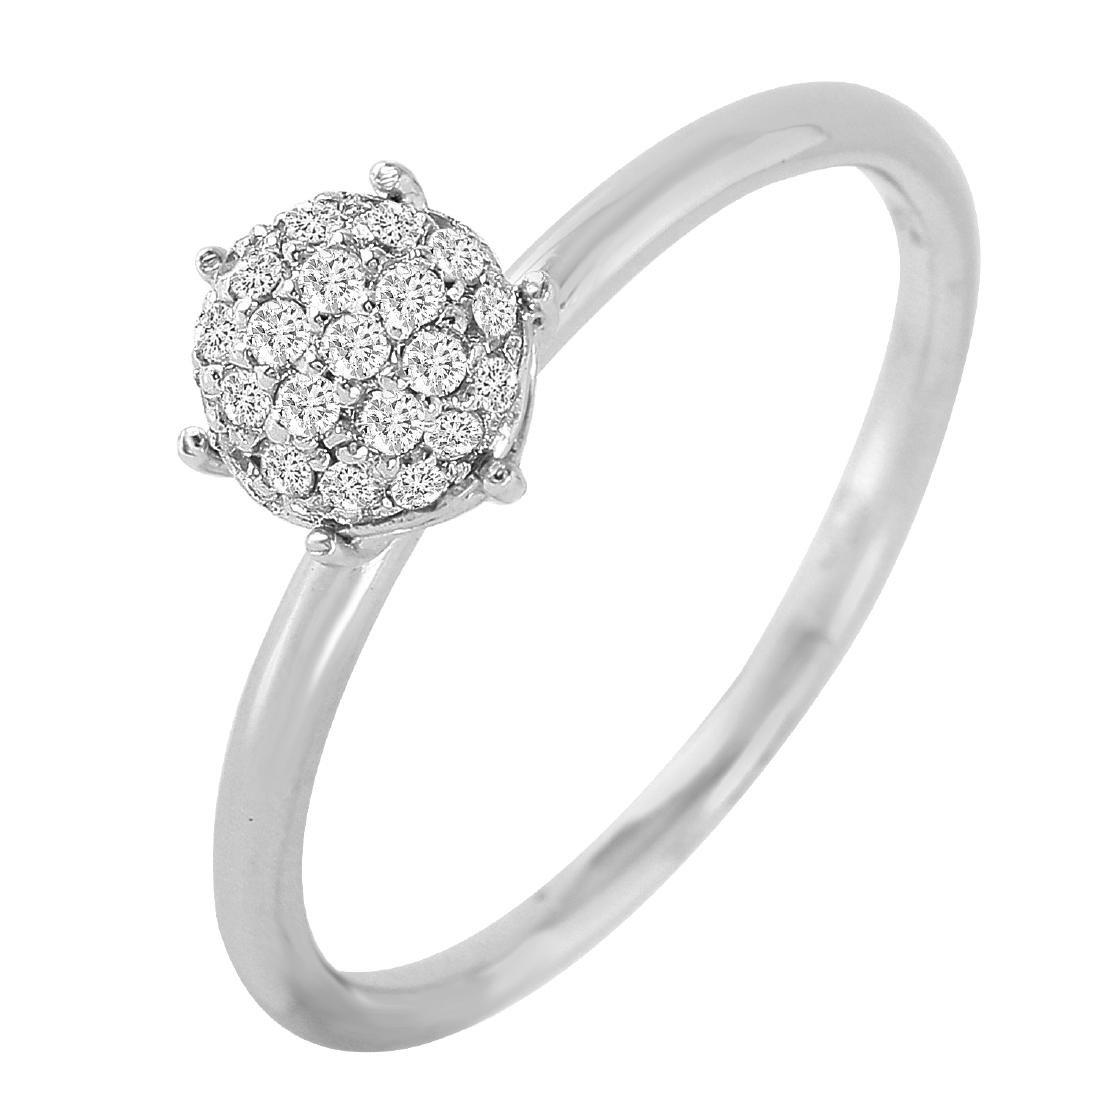 0.19 Carat Natural Diamond 18K Solid White Gold Ring